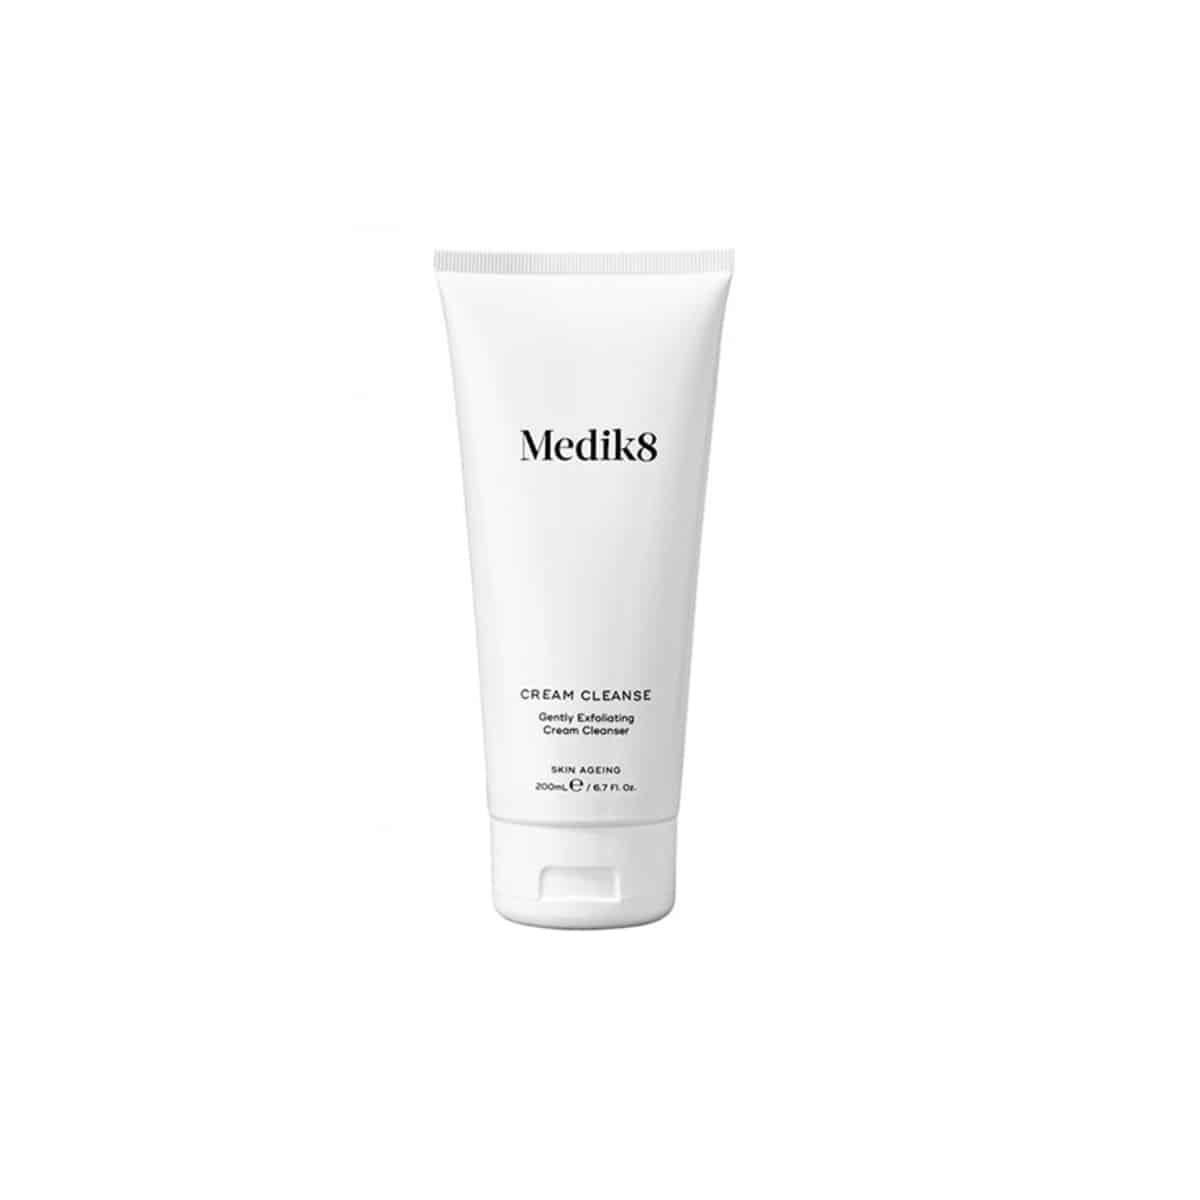 Medik8 Cream Cleanse Ireland